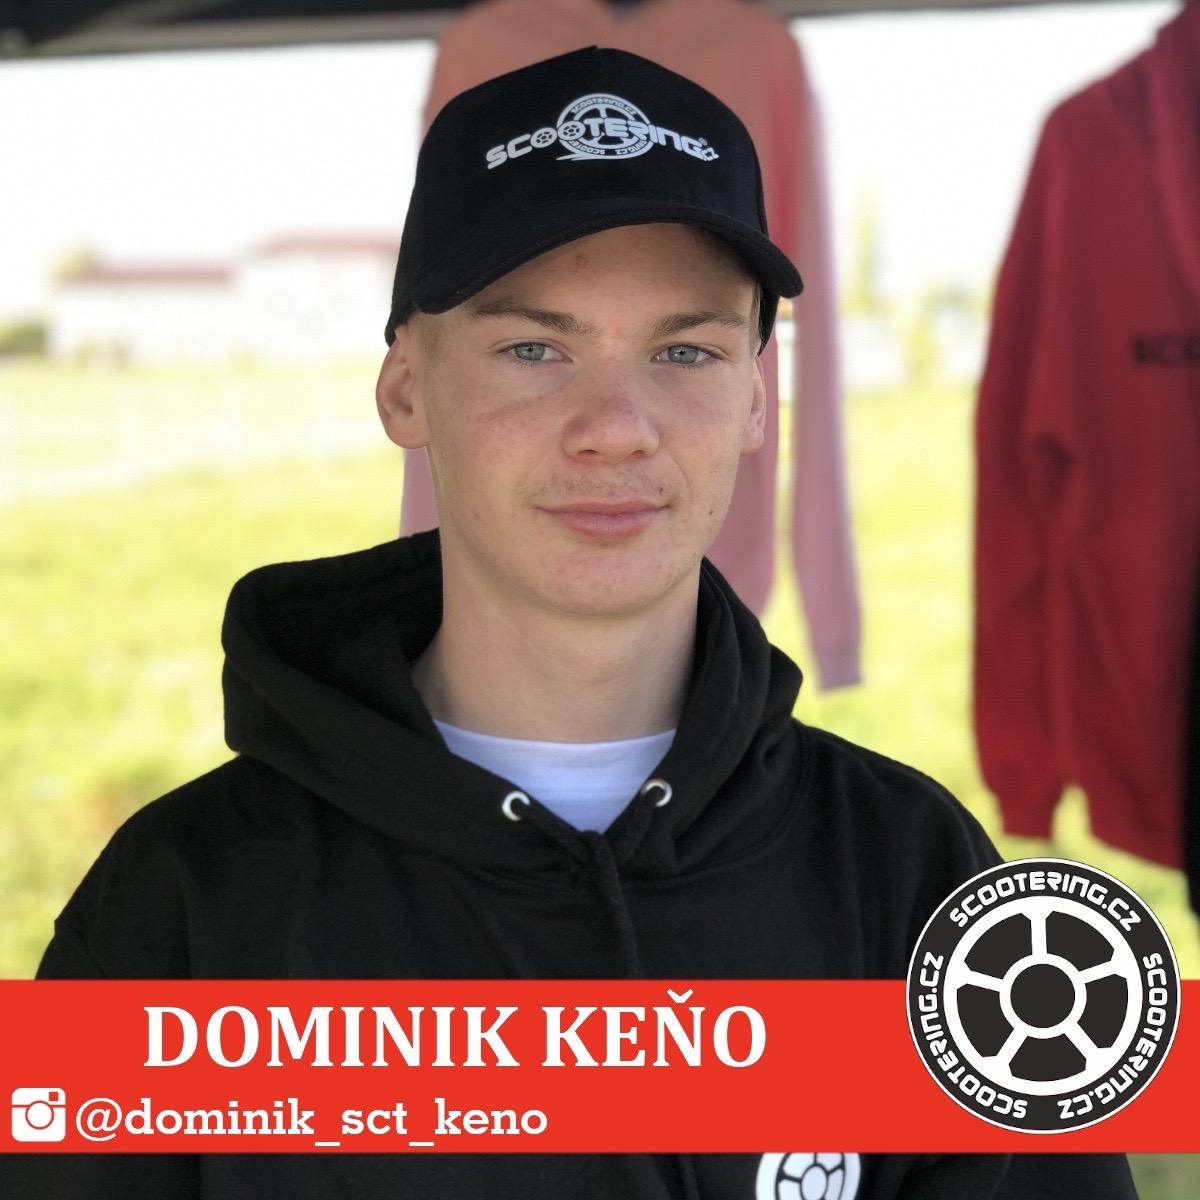 Dominik Keňo